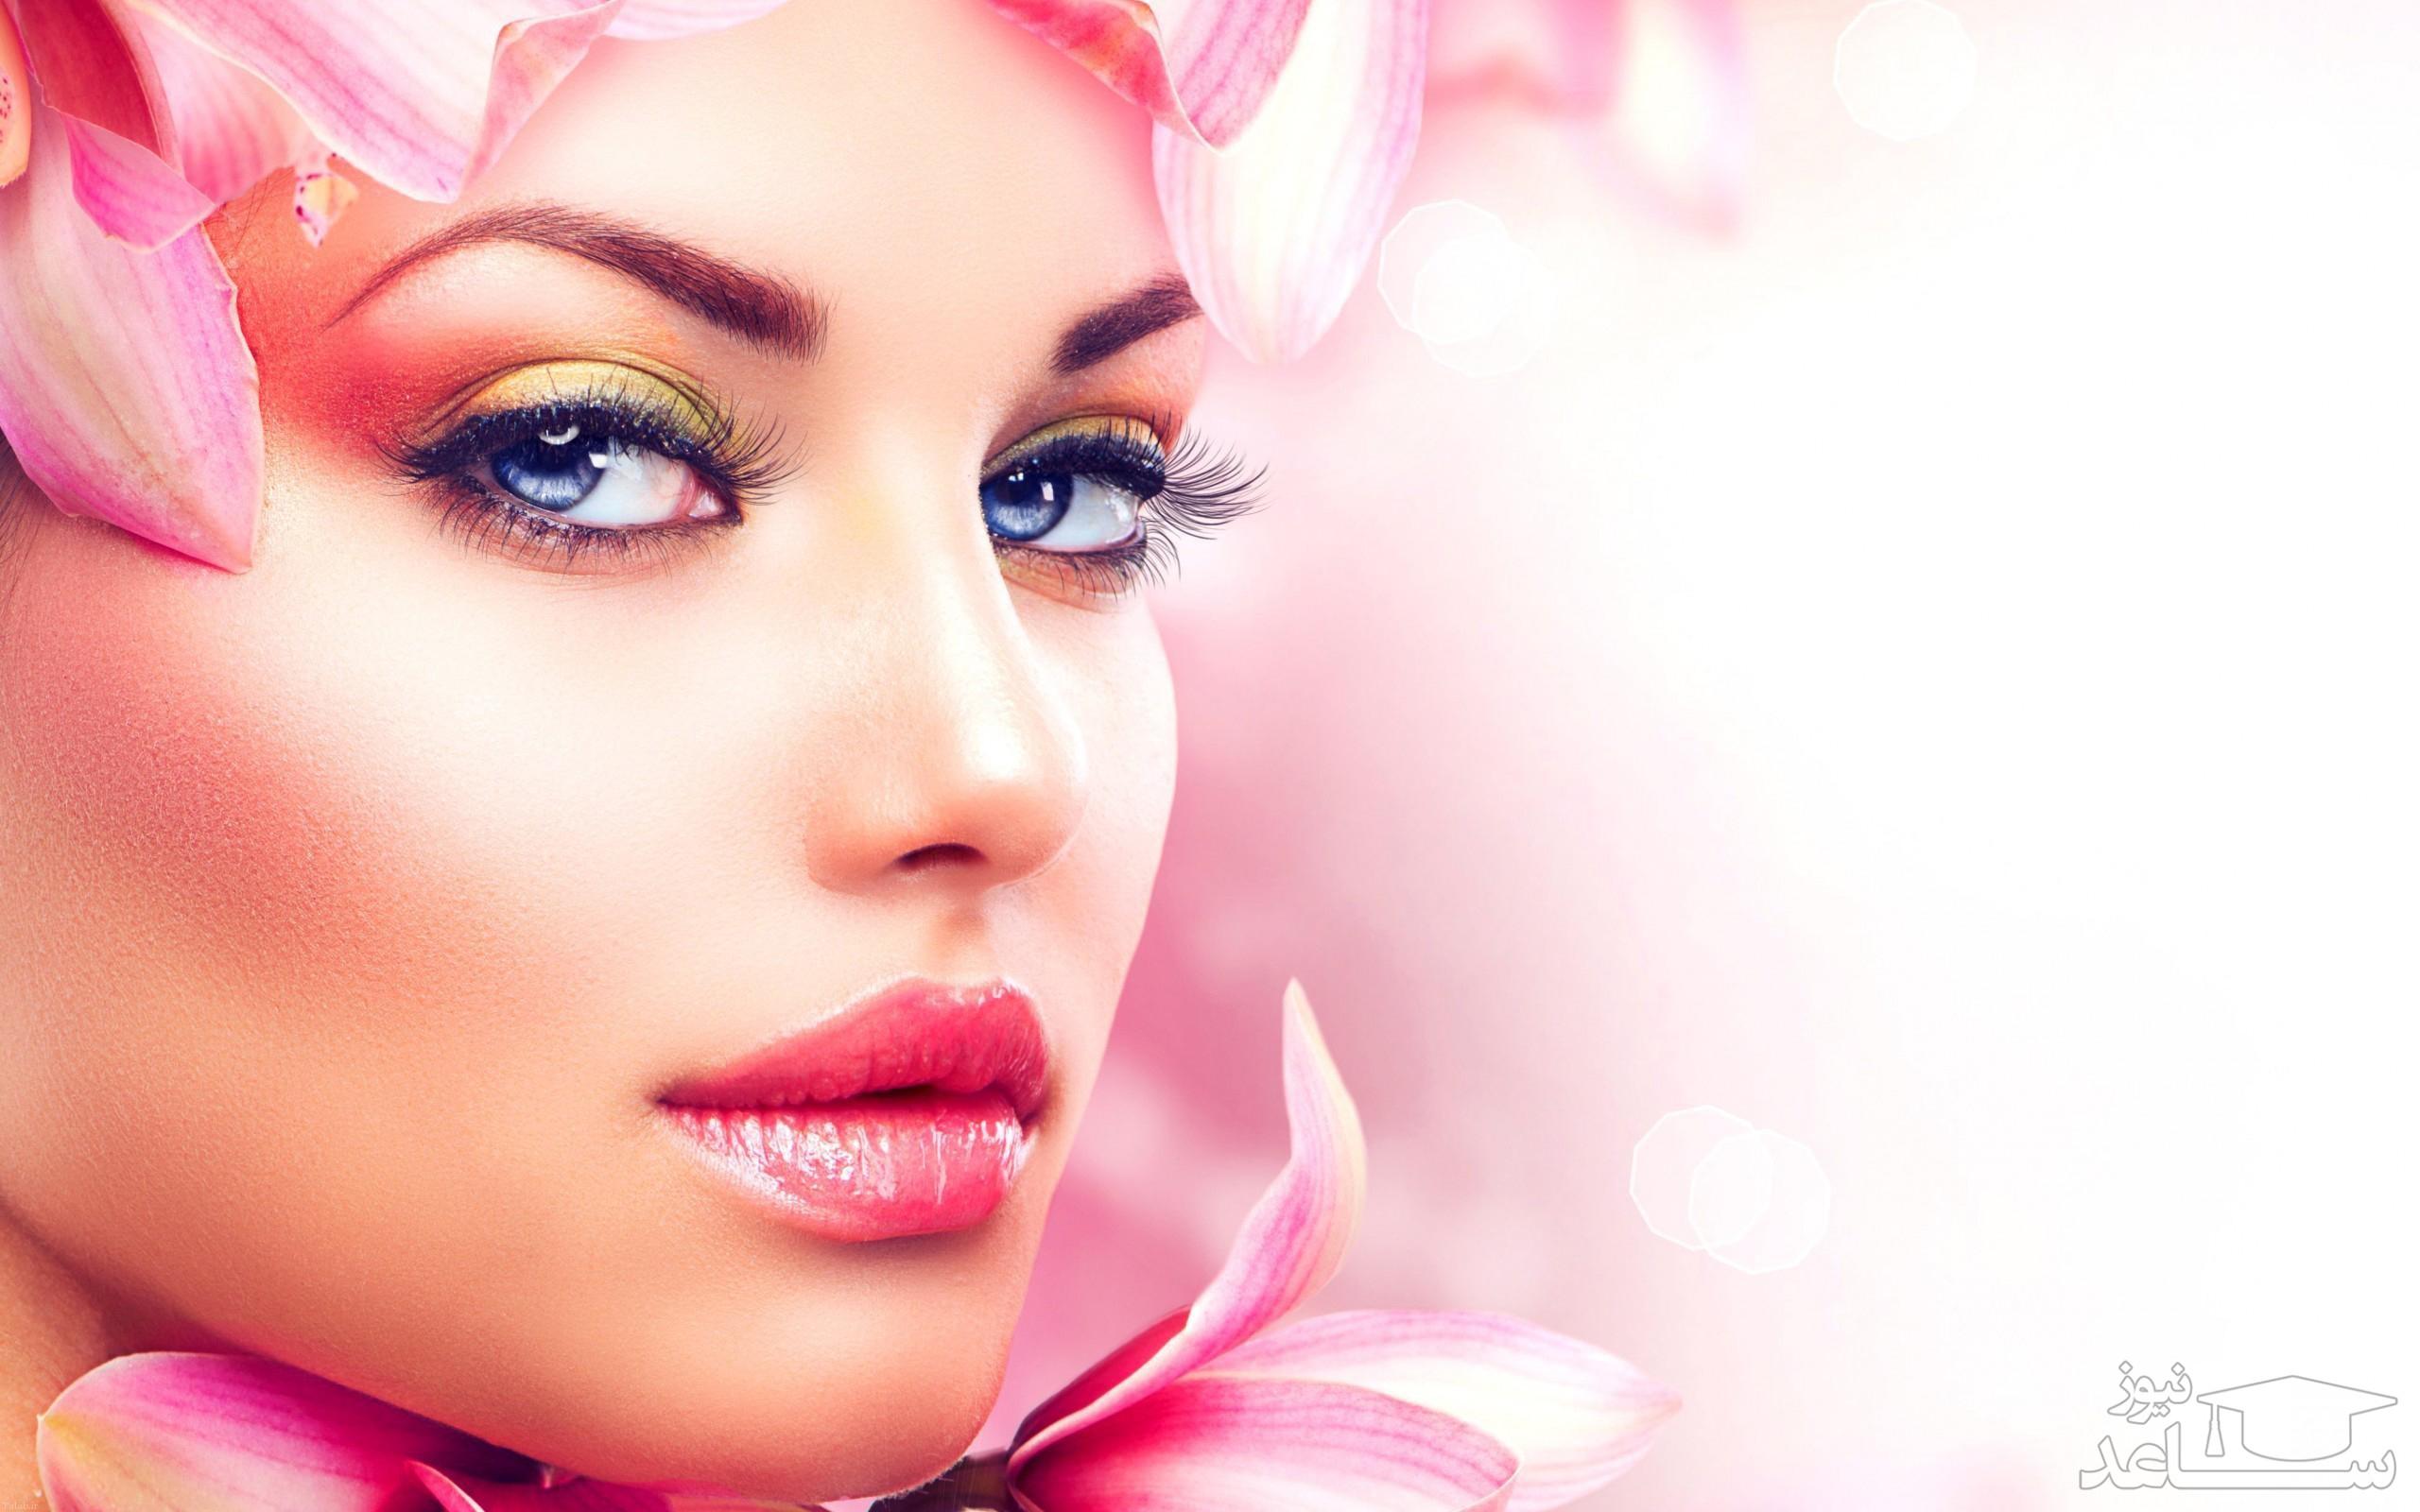 عوارض آرایش غلیظ بر پوست